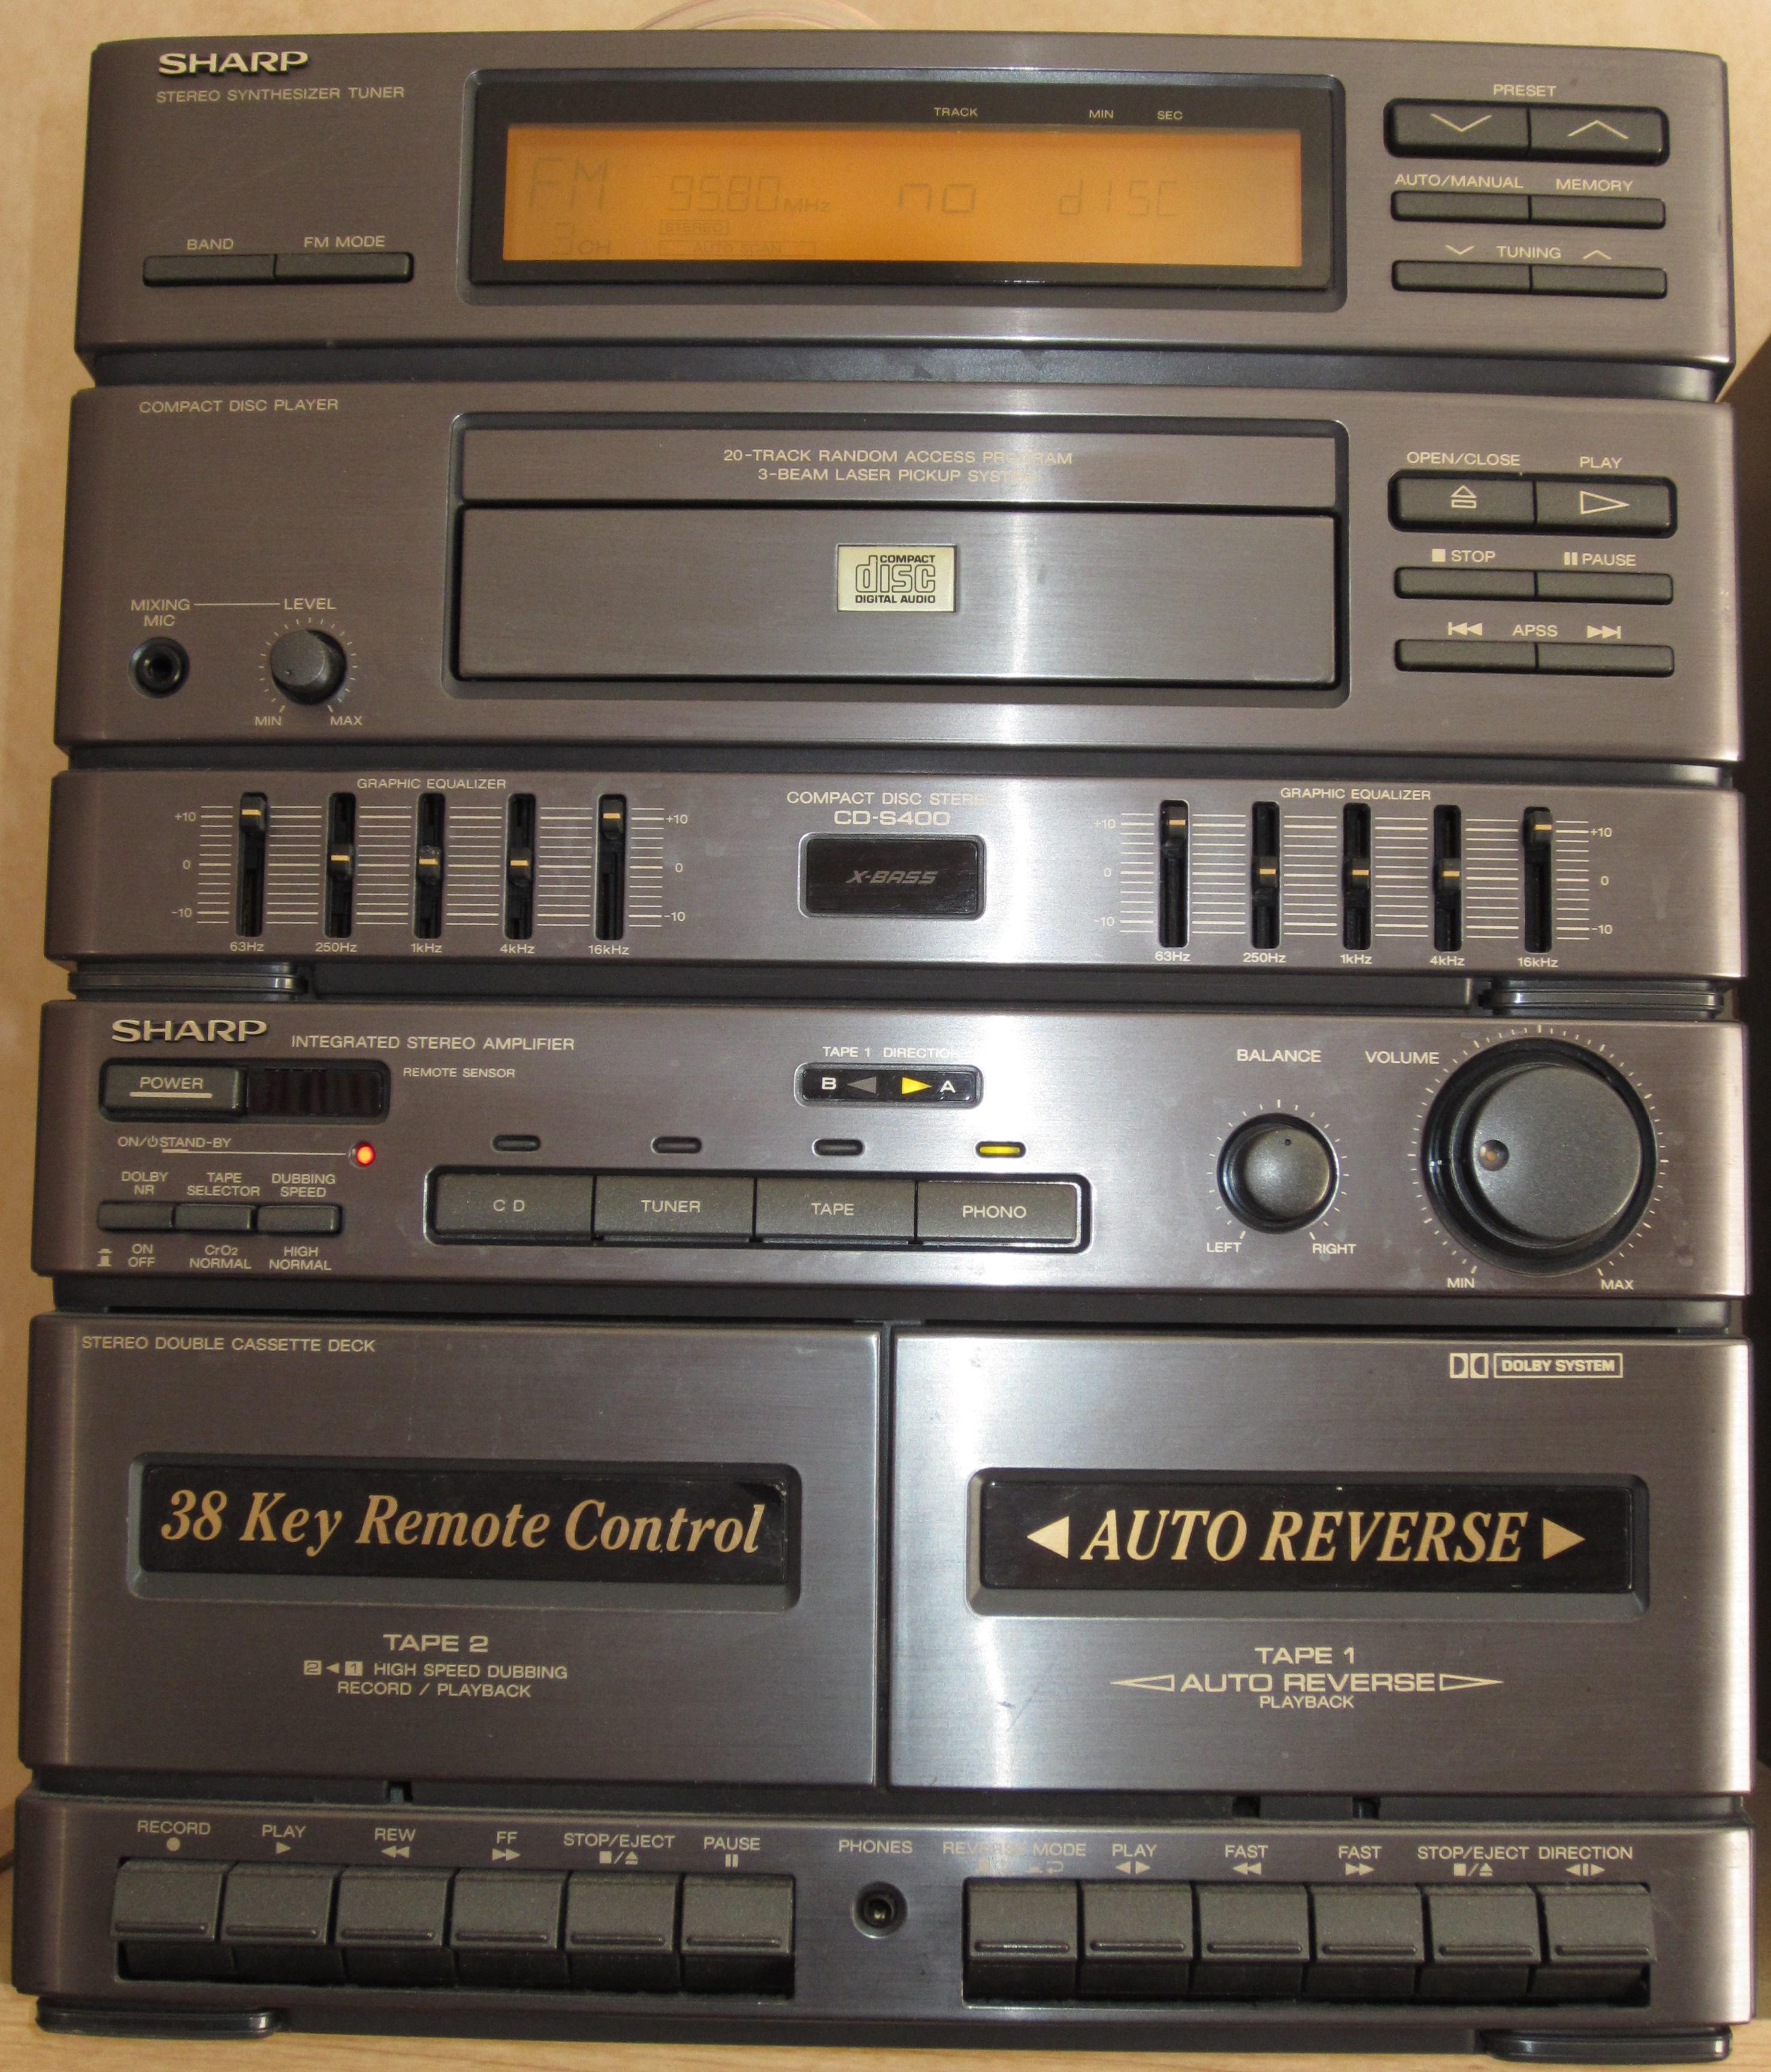 file sharp cd s400 jpg wikimedia commons rh commons wikimedia org Sharp TV Sound Bar Systems Sharp 5 CD Stereo System